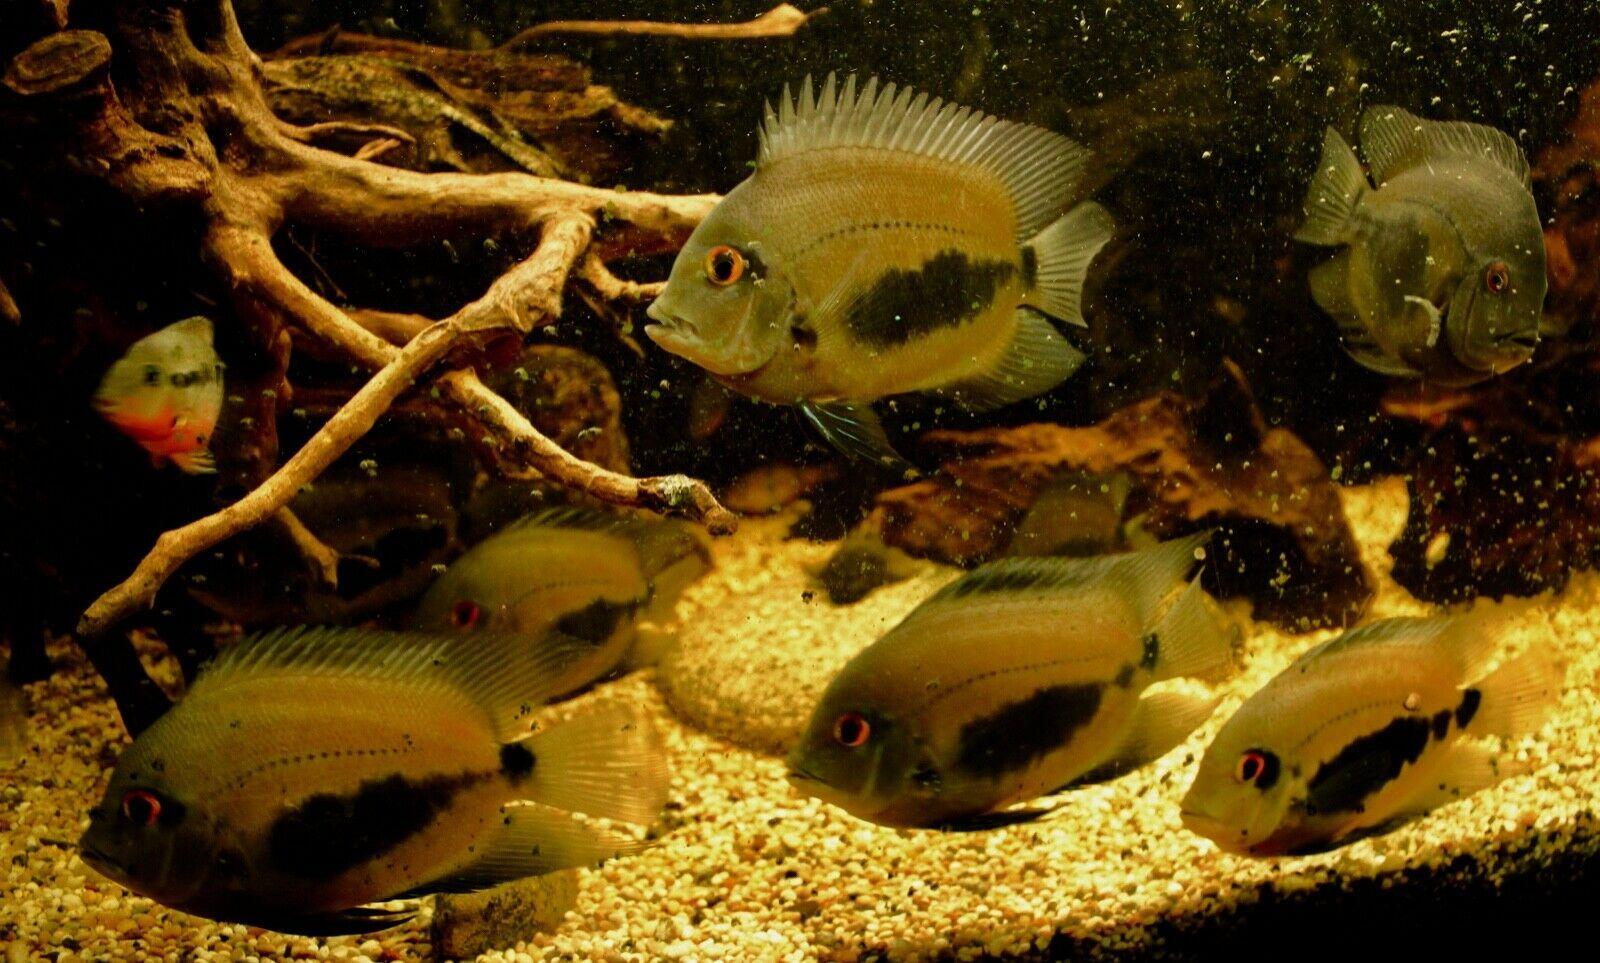 Uaru Cichlid Group of Ten Fish in 2020 Cichlids, South